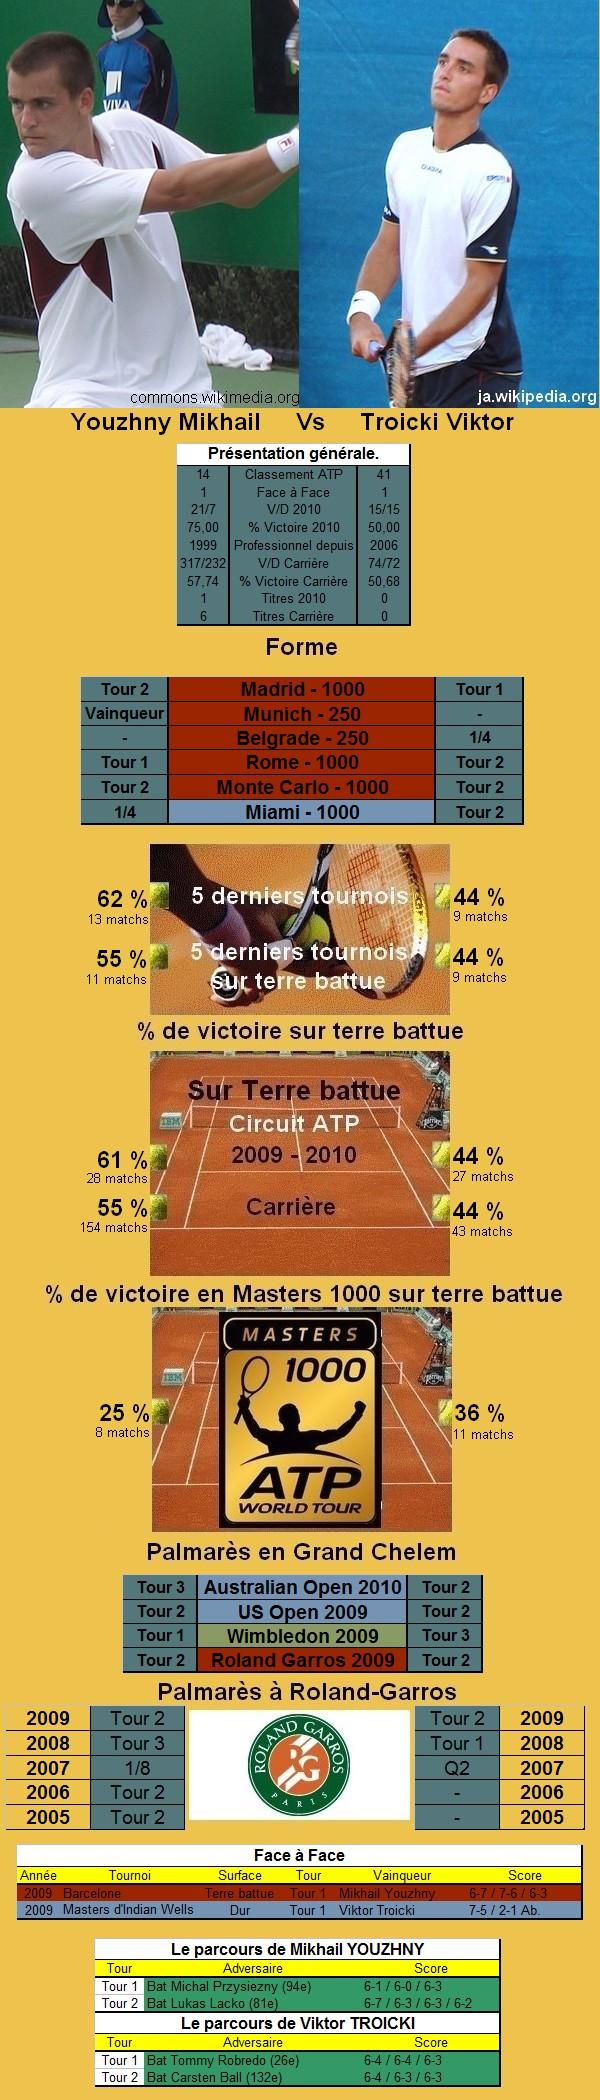 Statistiques tennis de Youzhny contre Troicki à Roland Garros